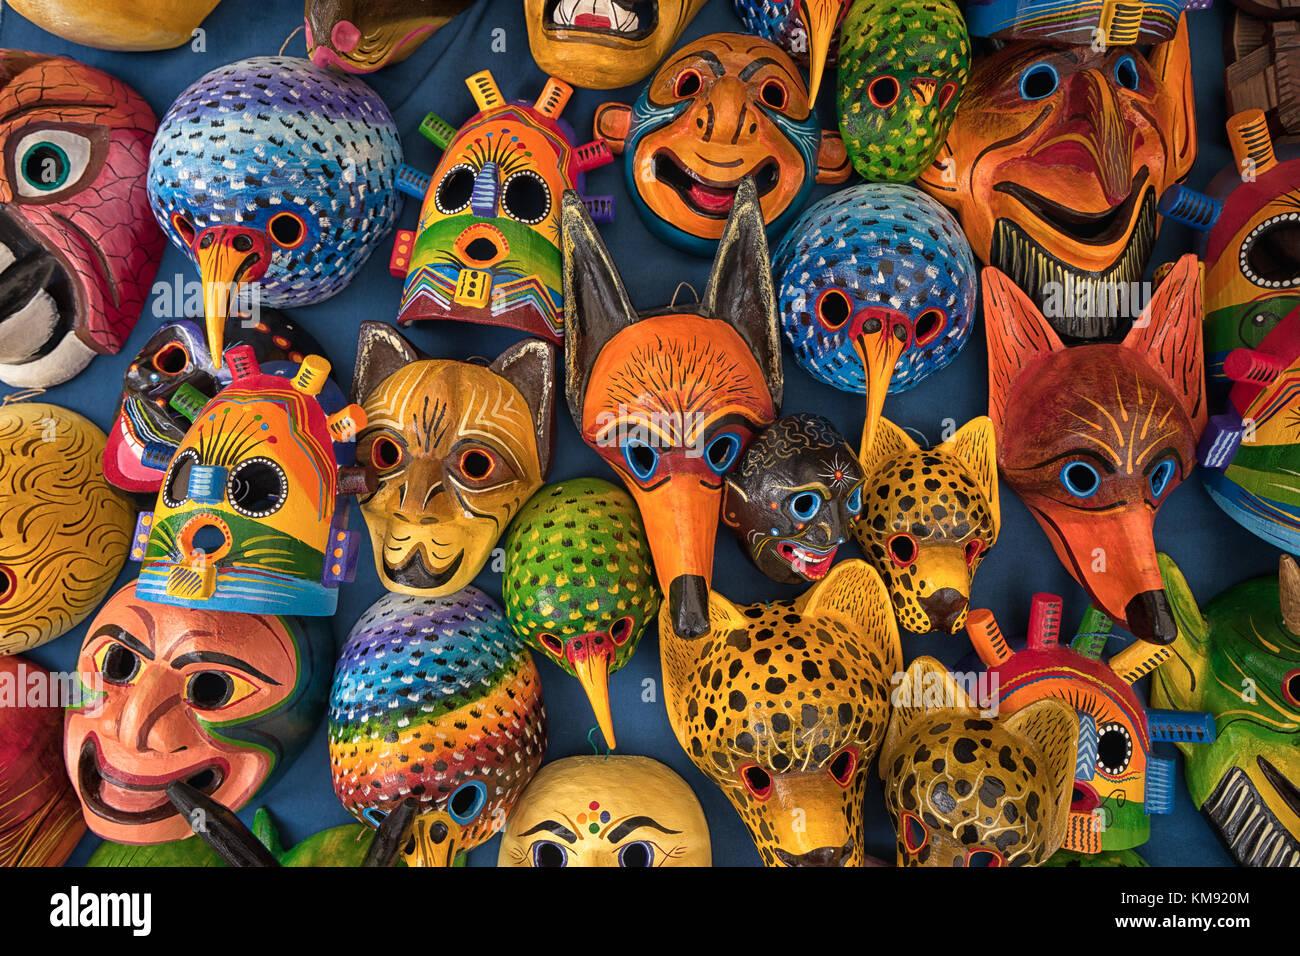 Otavalo, Ecuador - 2 de diciembre de 2017: Primer plano de coloridas esculturas de madera autóctona en el mercado Imagen De Stock